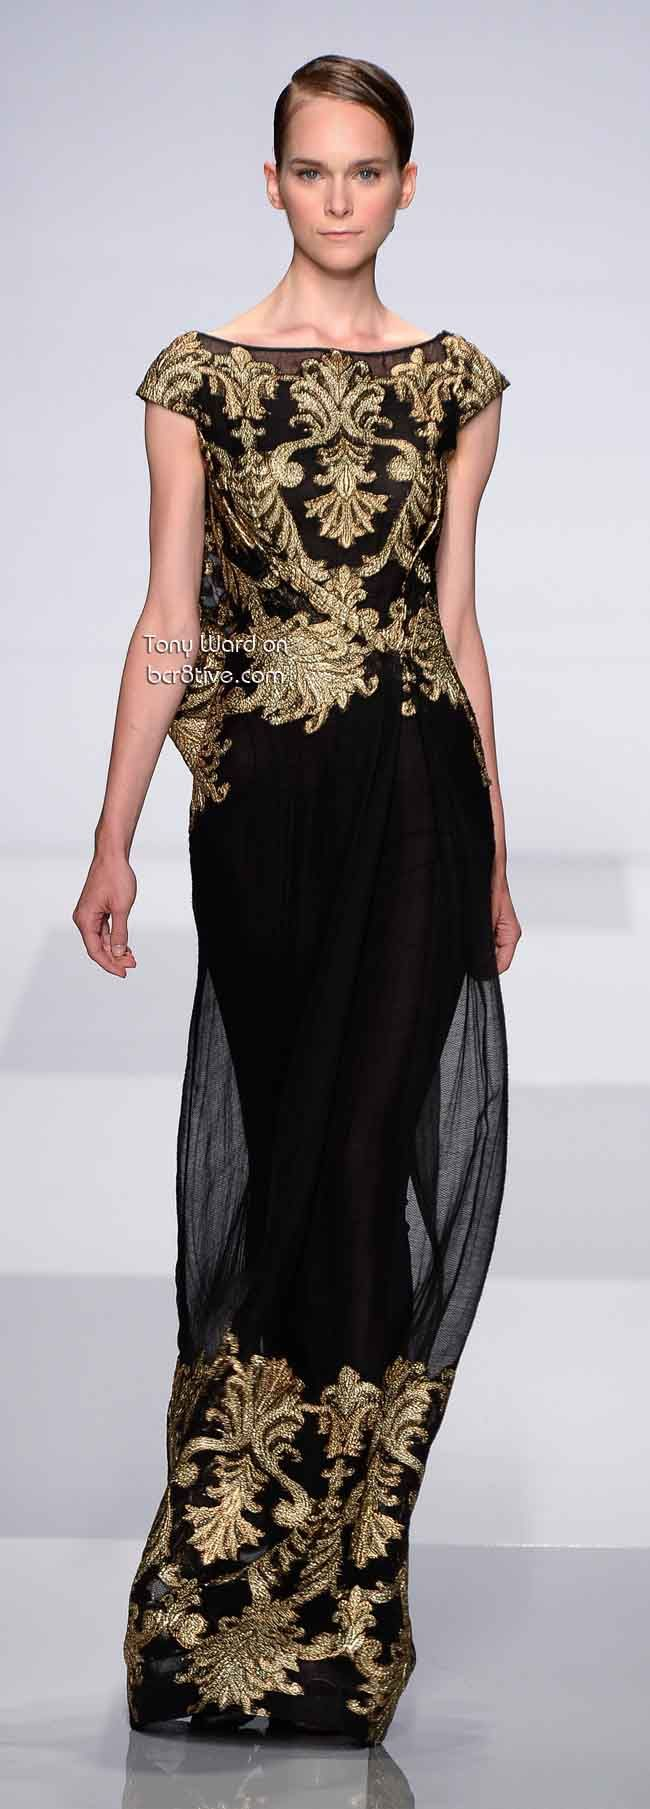 Tony Ward Couture Fall Winter 2013-14 »